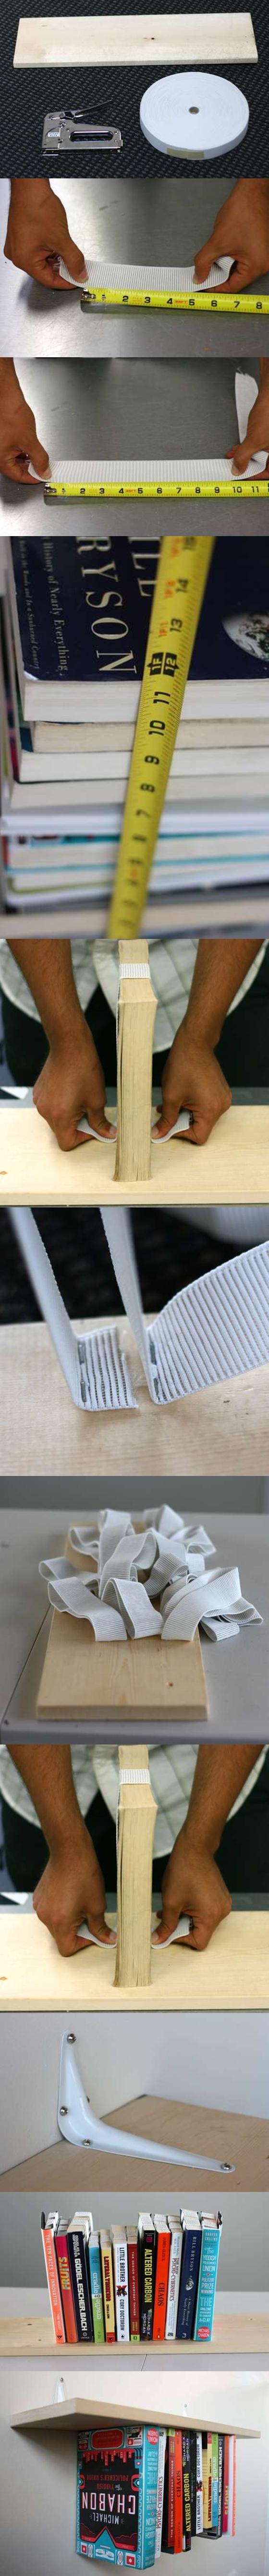 DIY Tutorial To Create An Inverted Bookshelf